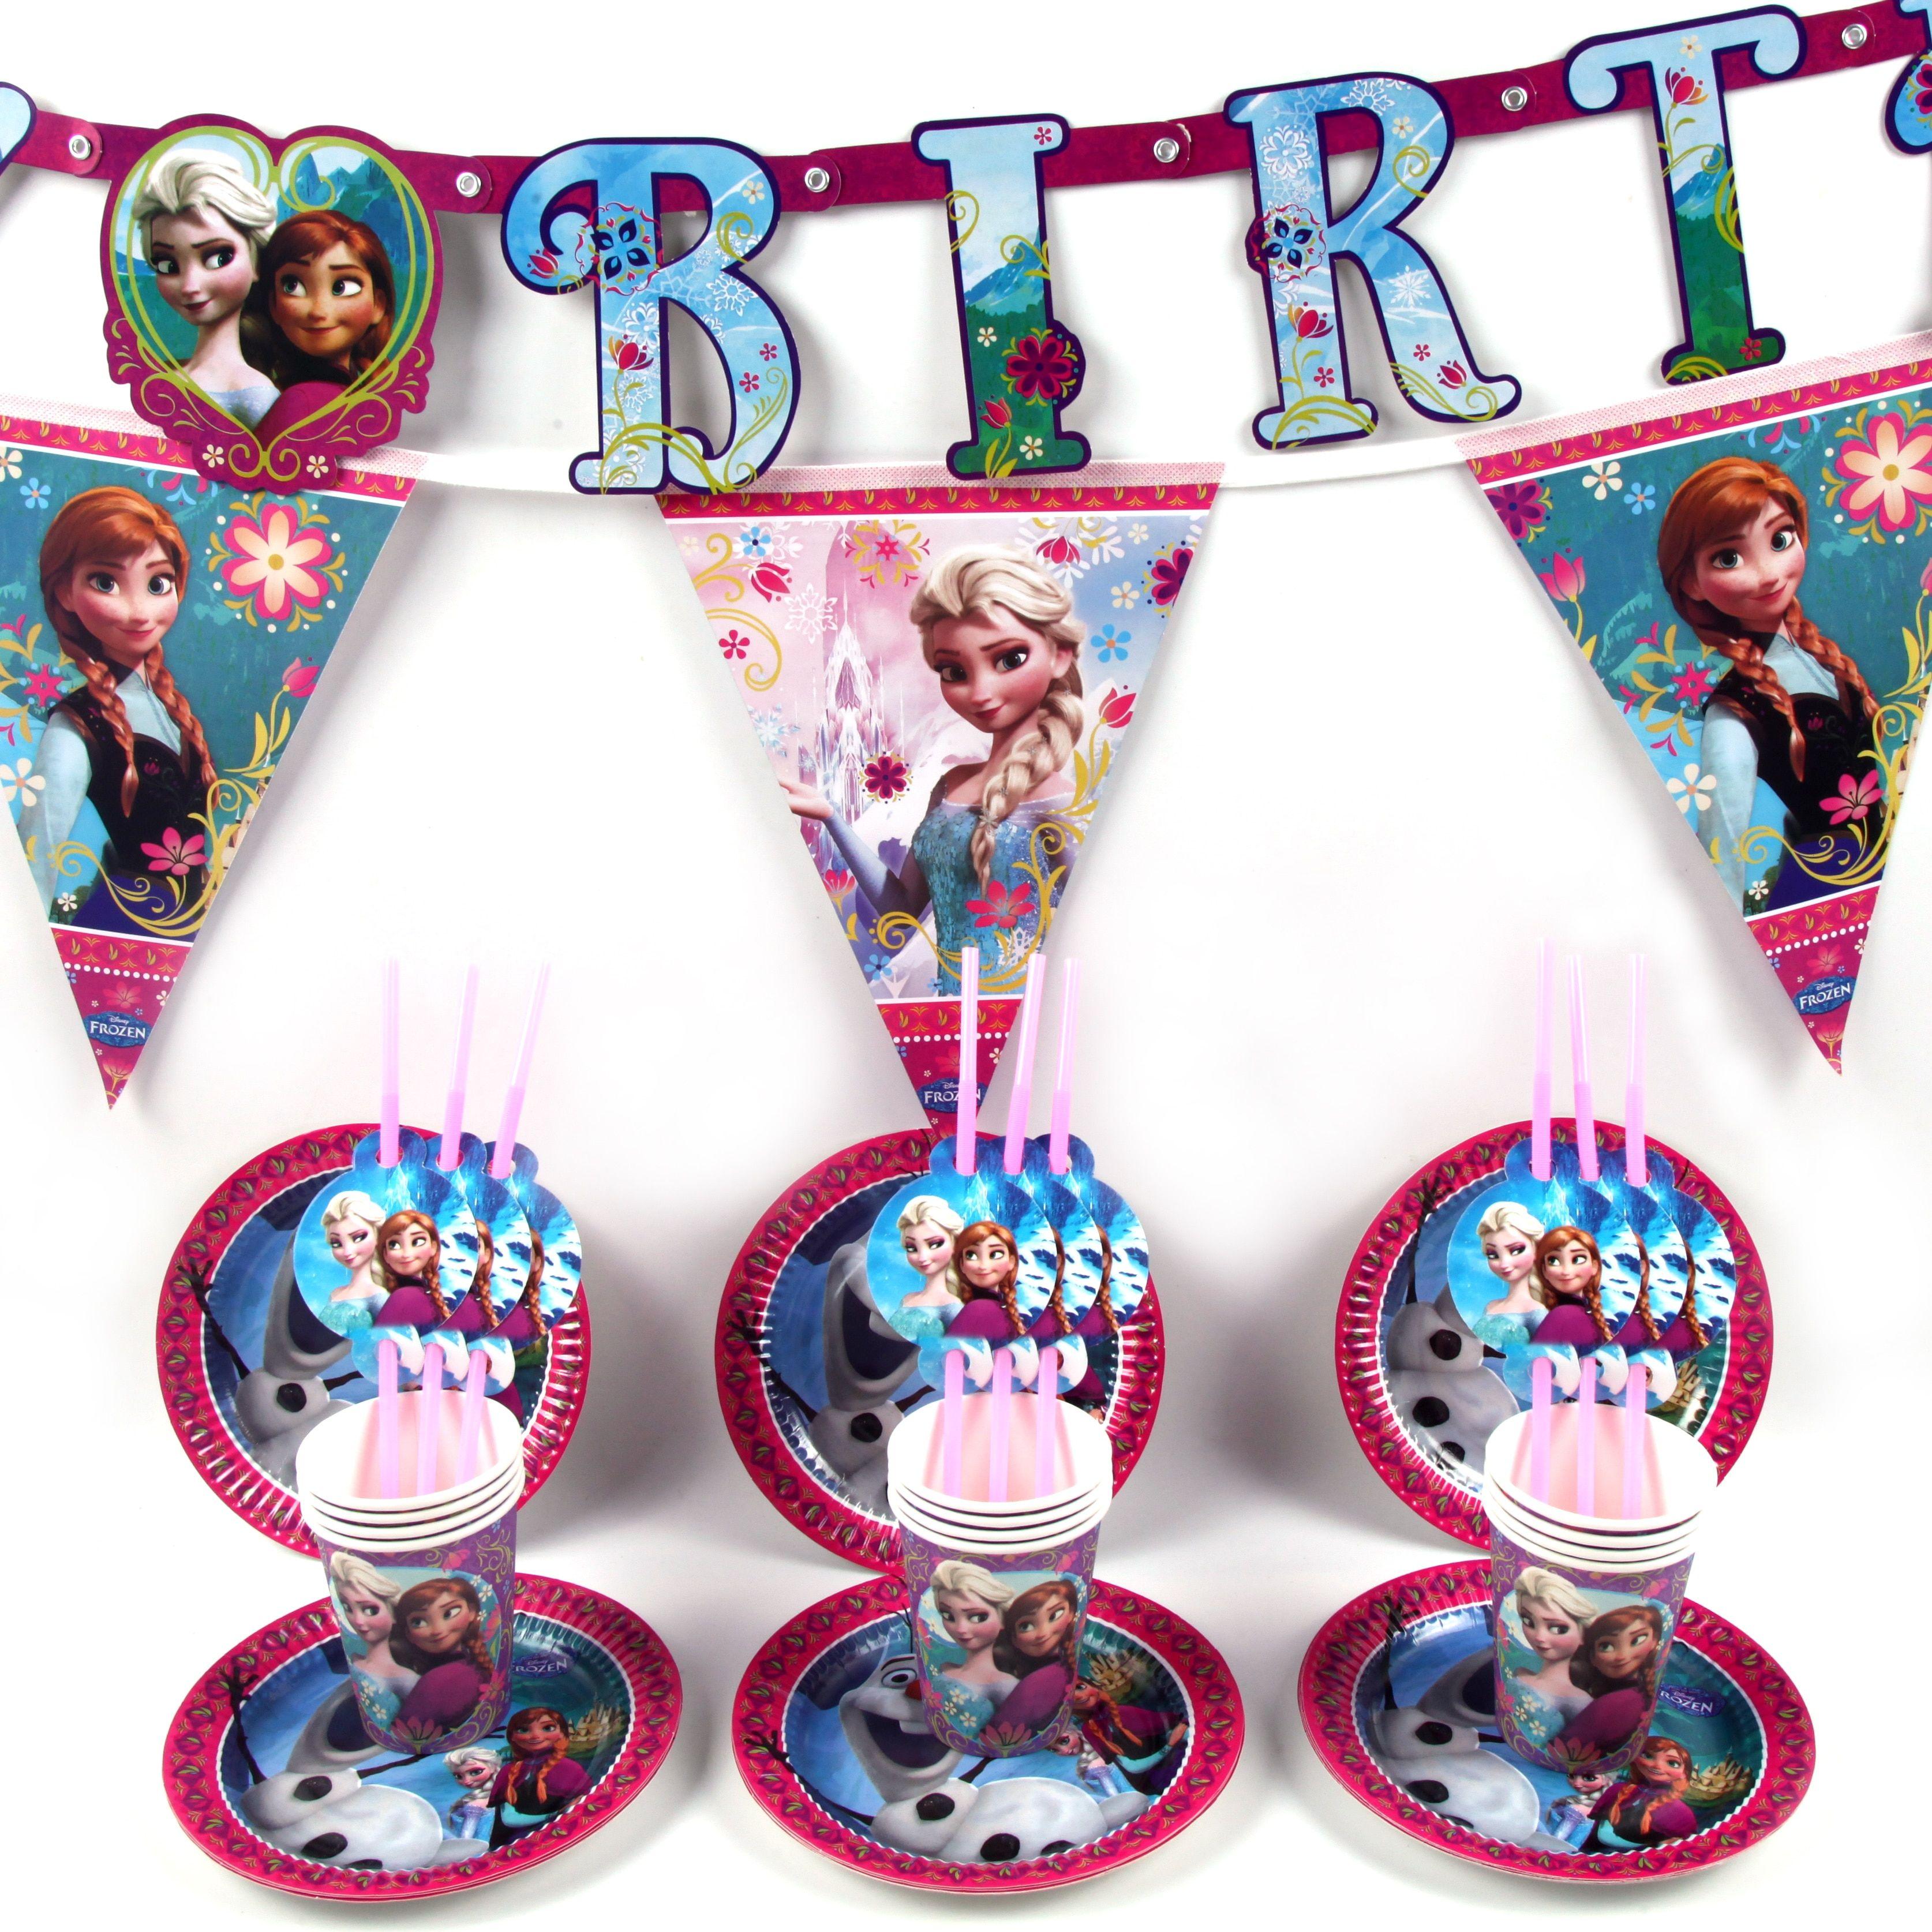 6 x Frozen  Party Themed Friendship Bracelets Kids Birthday Bag Favour Anna Elsa